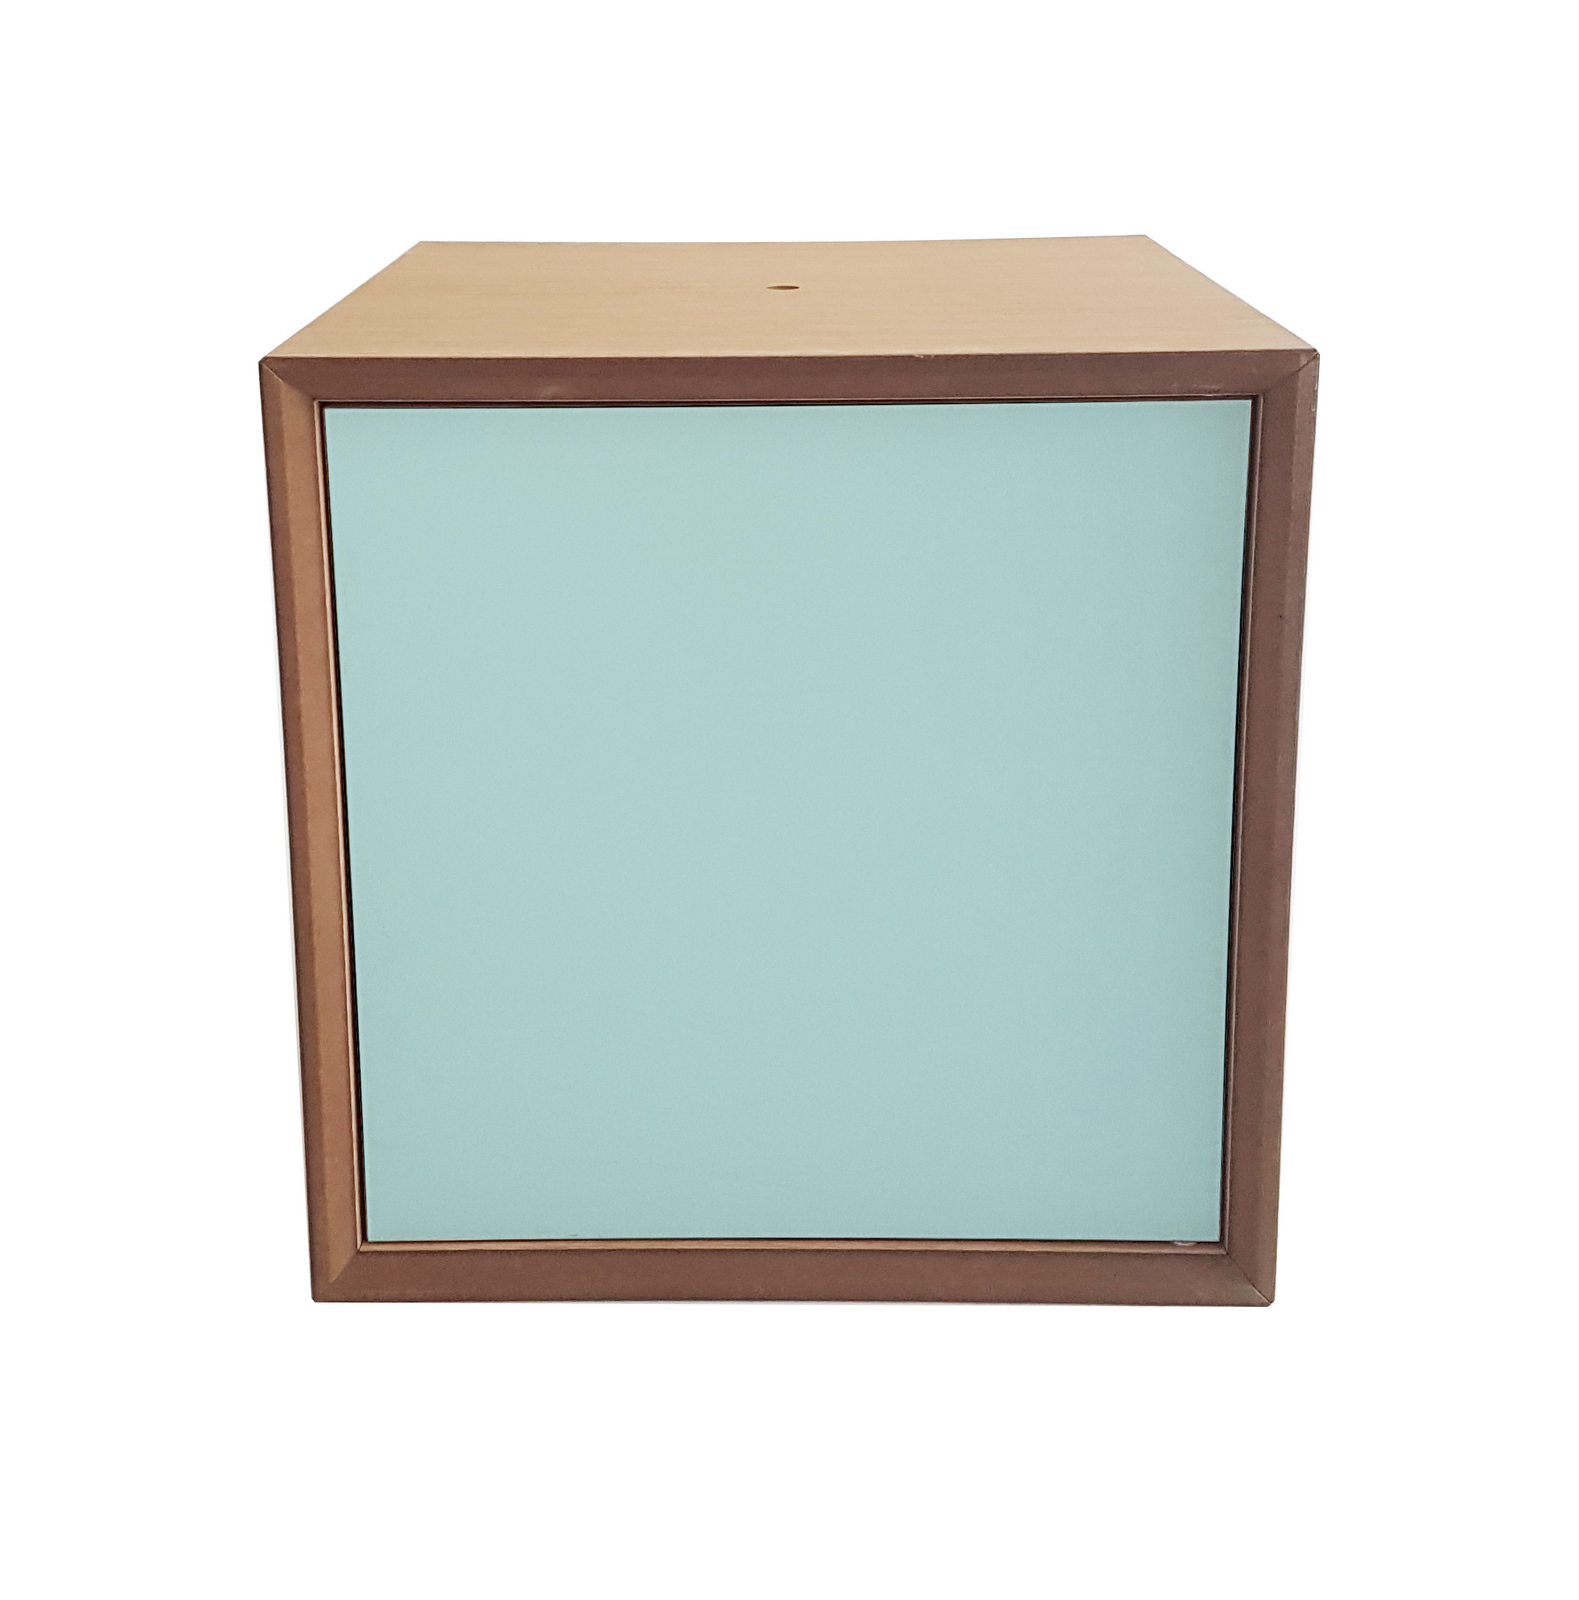 Dulap modular Pixel Light Turquoise, L40xl40xh40 cm